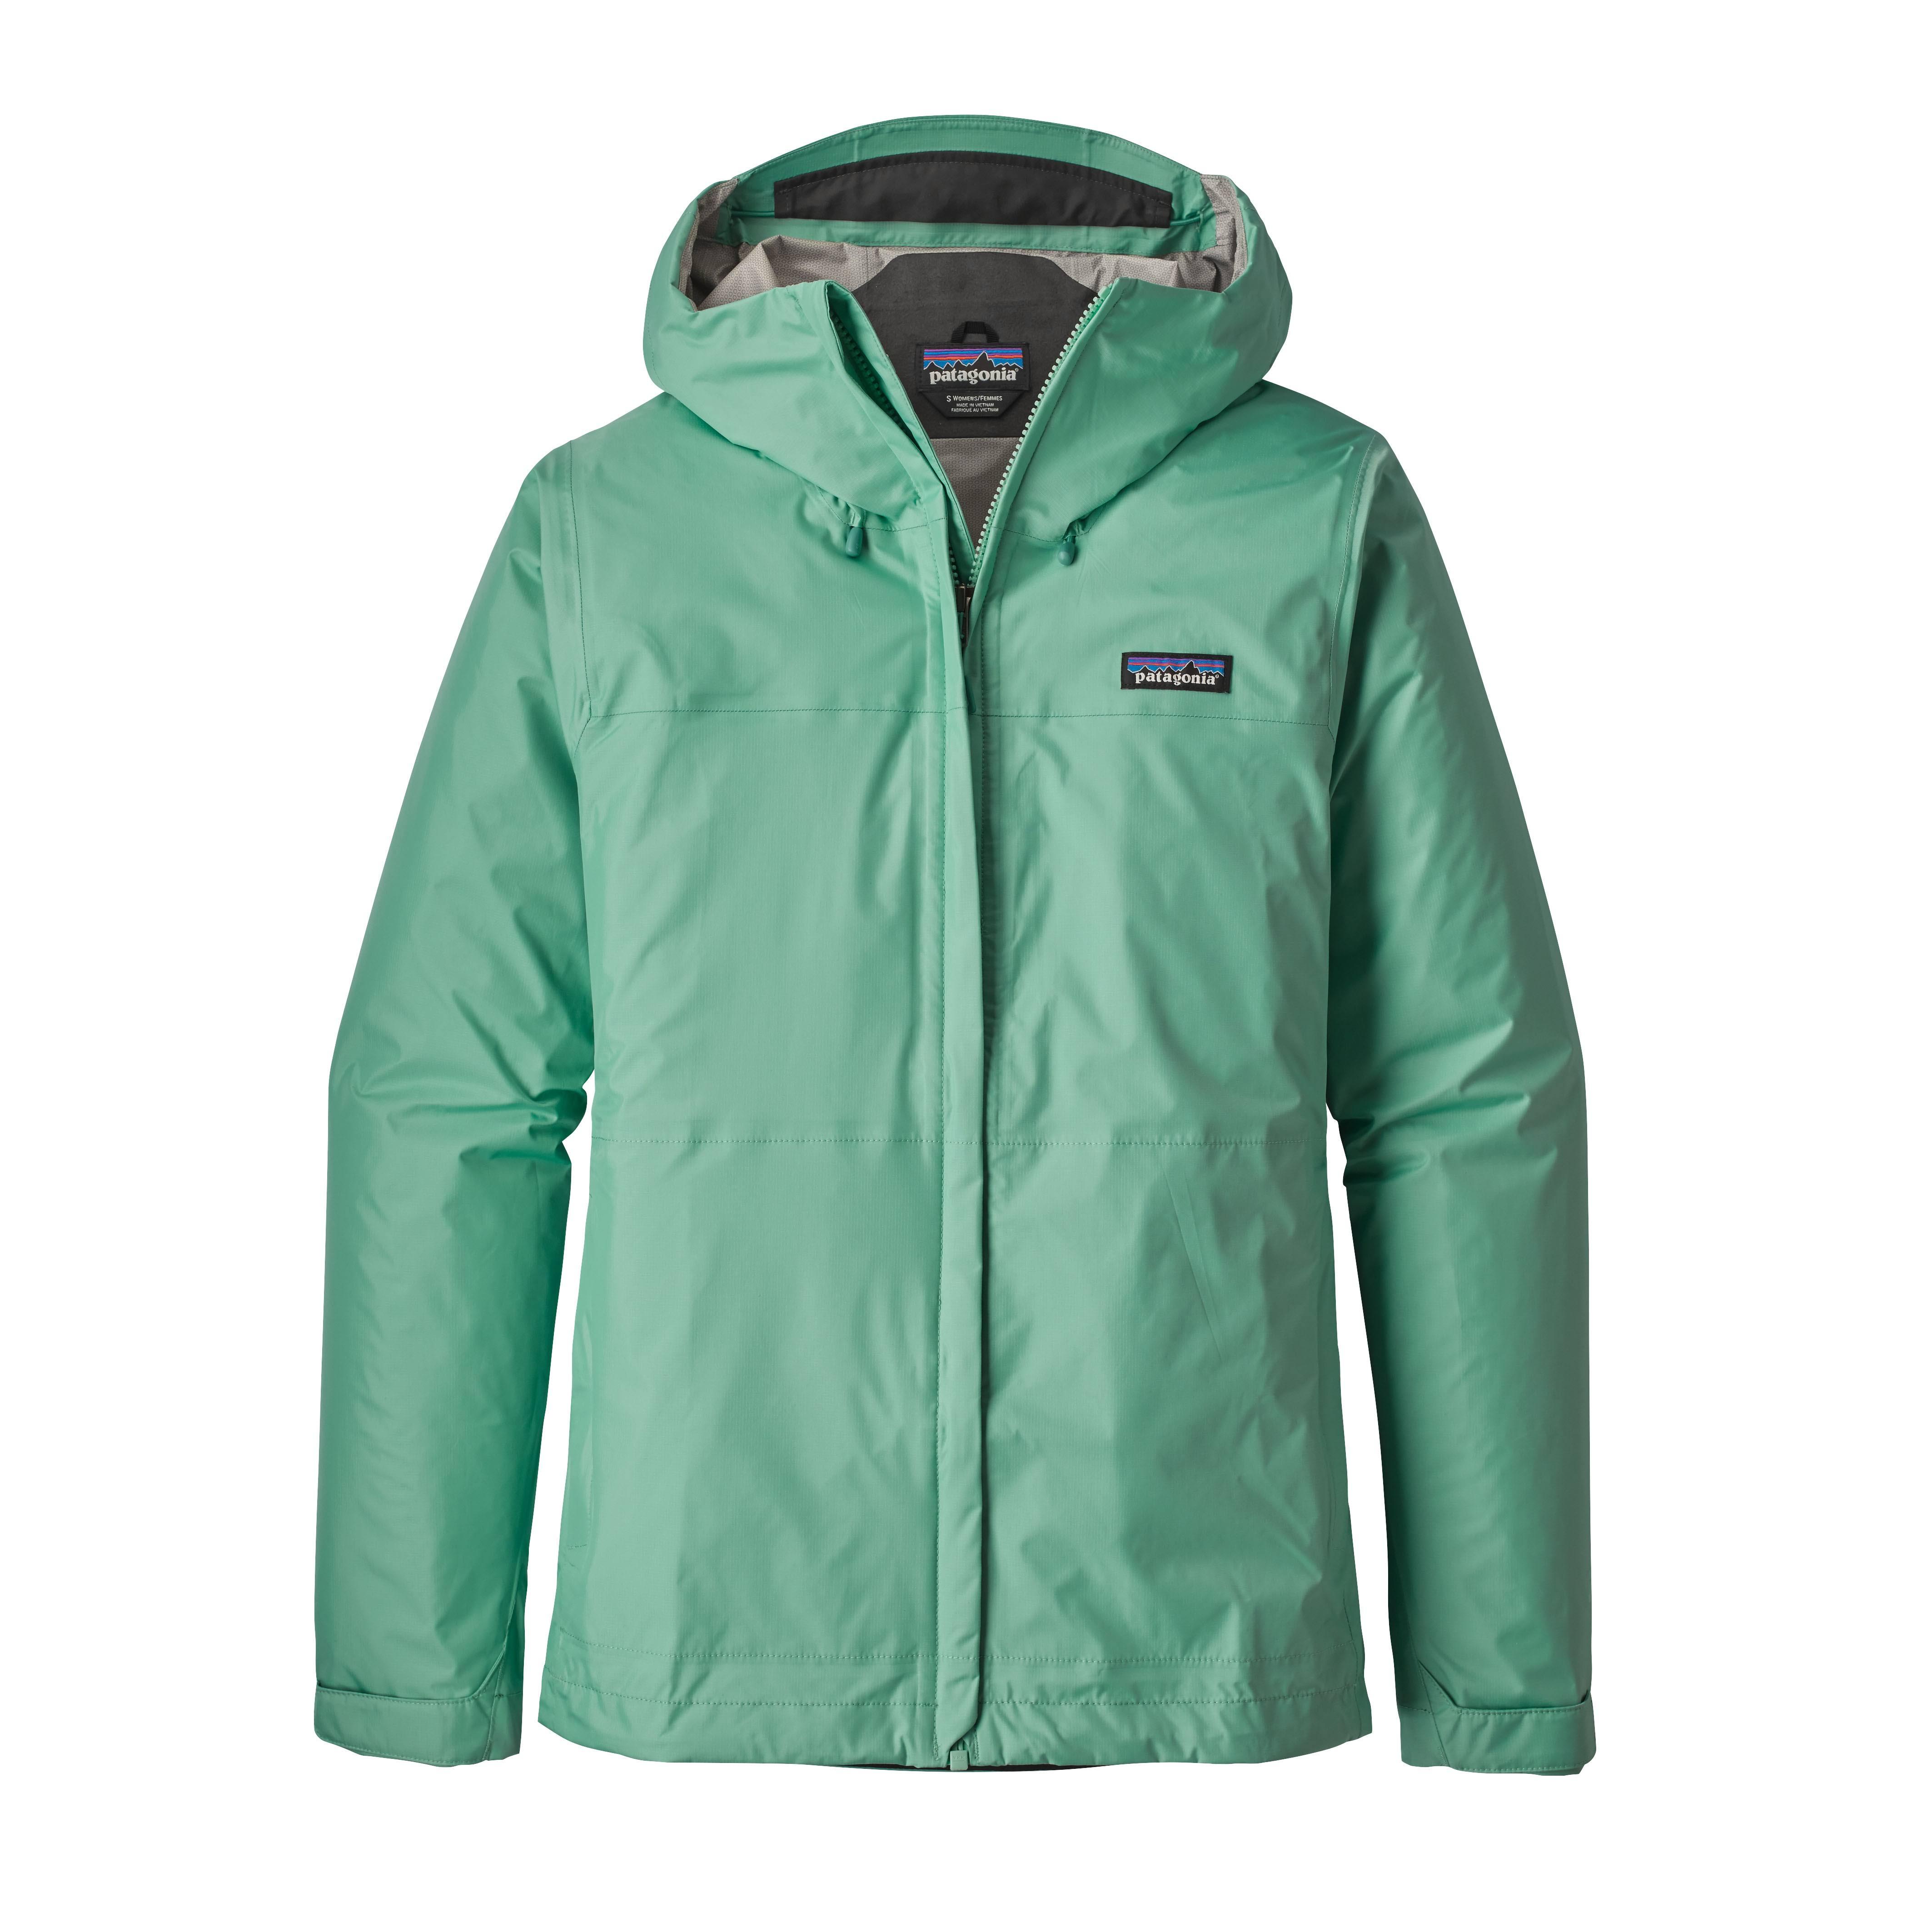 Xxs Para Vjosa Jacket Green Mujer Patagonia Torrentshell qaIwYY